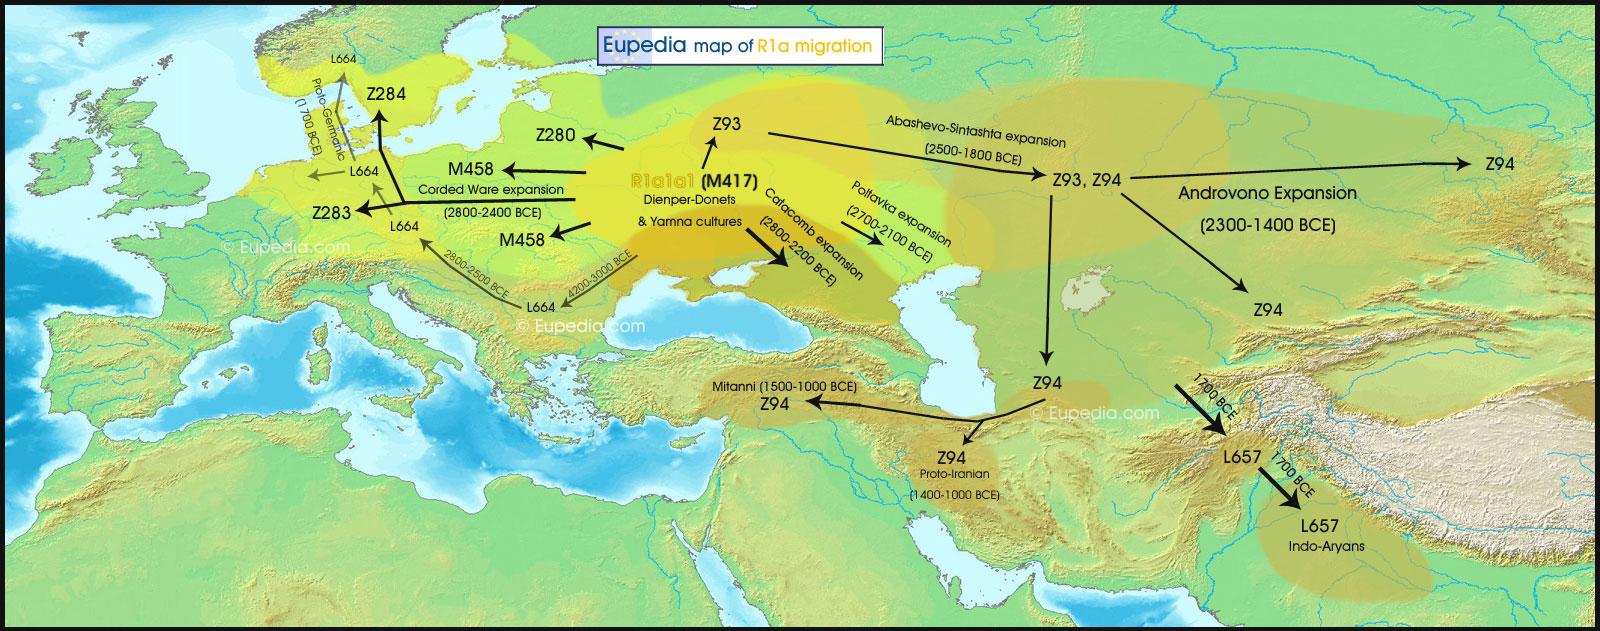 R1a_migration_map.jpg